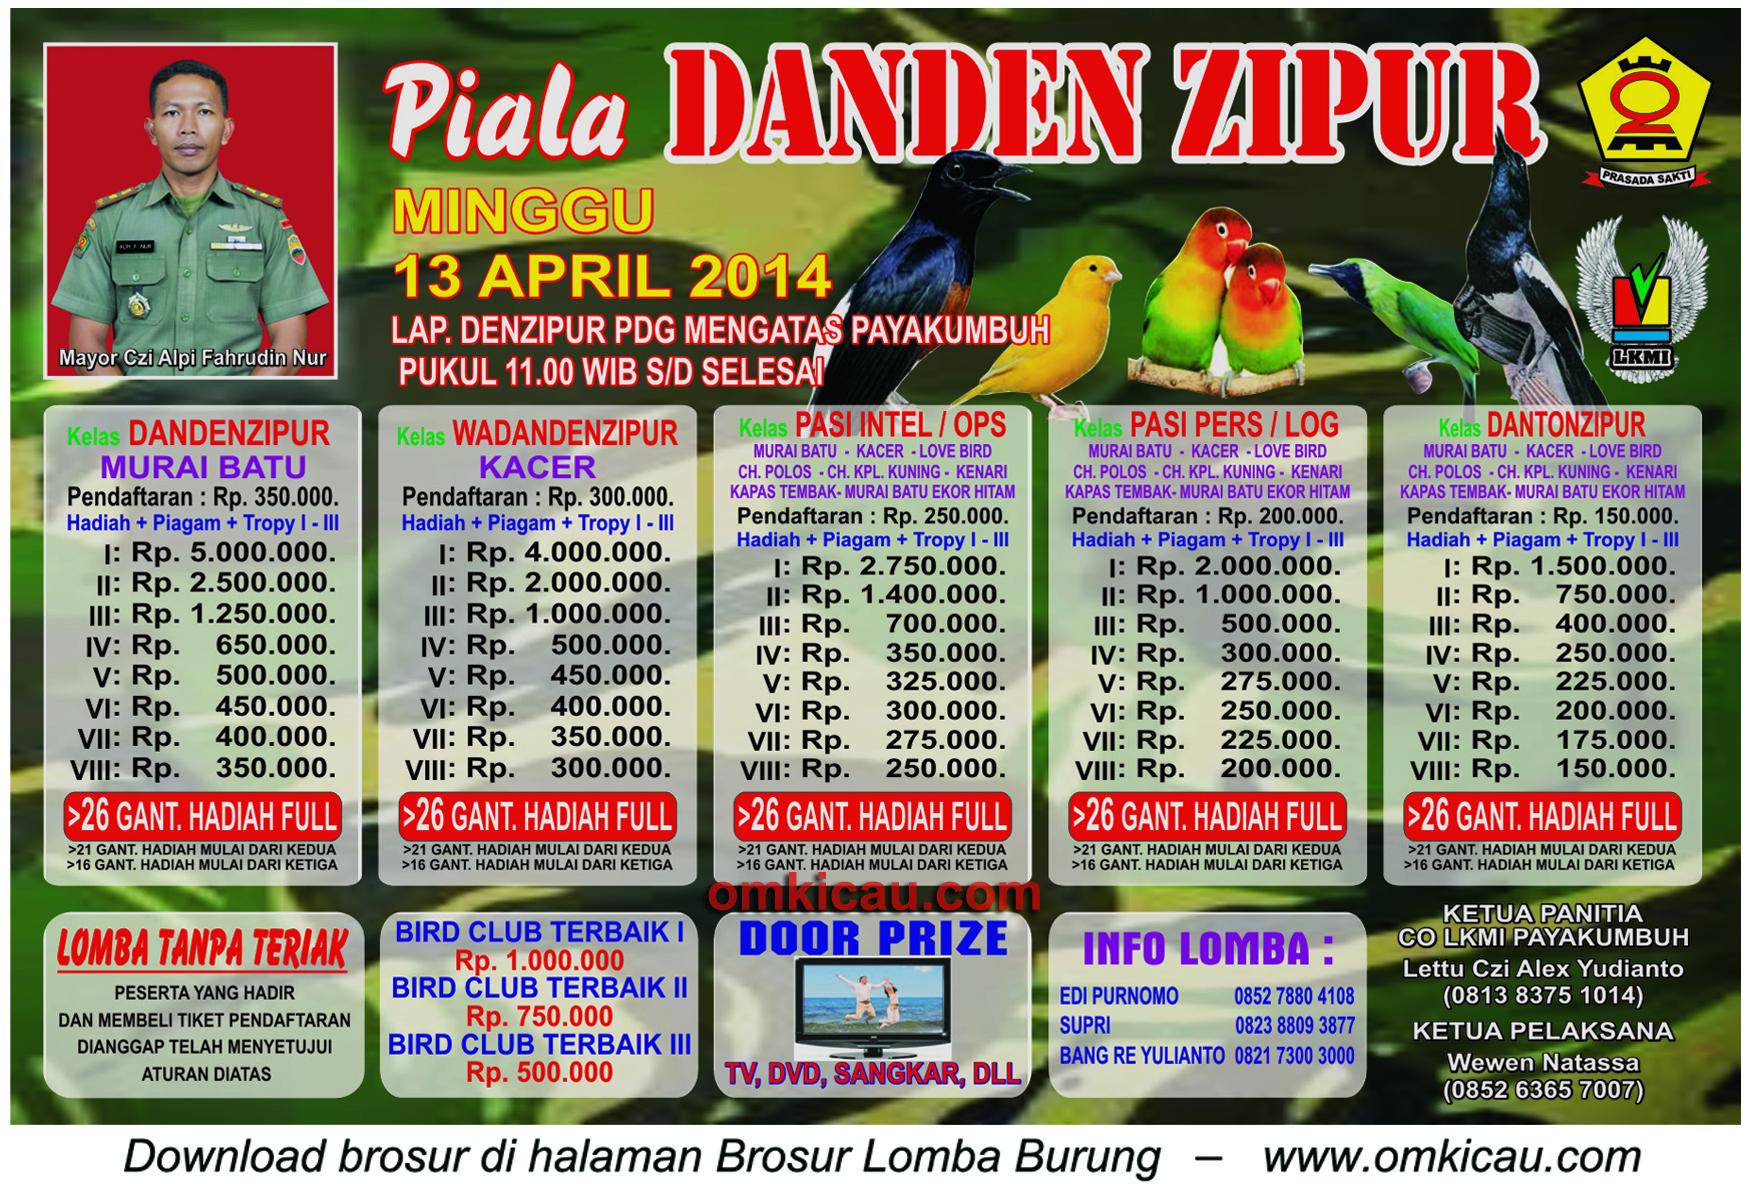 Brosur Lomba Burung Berkicau Piala Danden Zipur, Payakumbuh, 13 April 2014